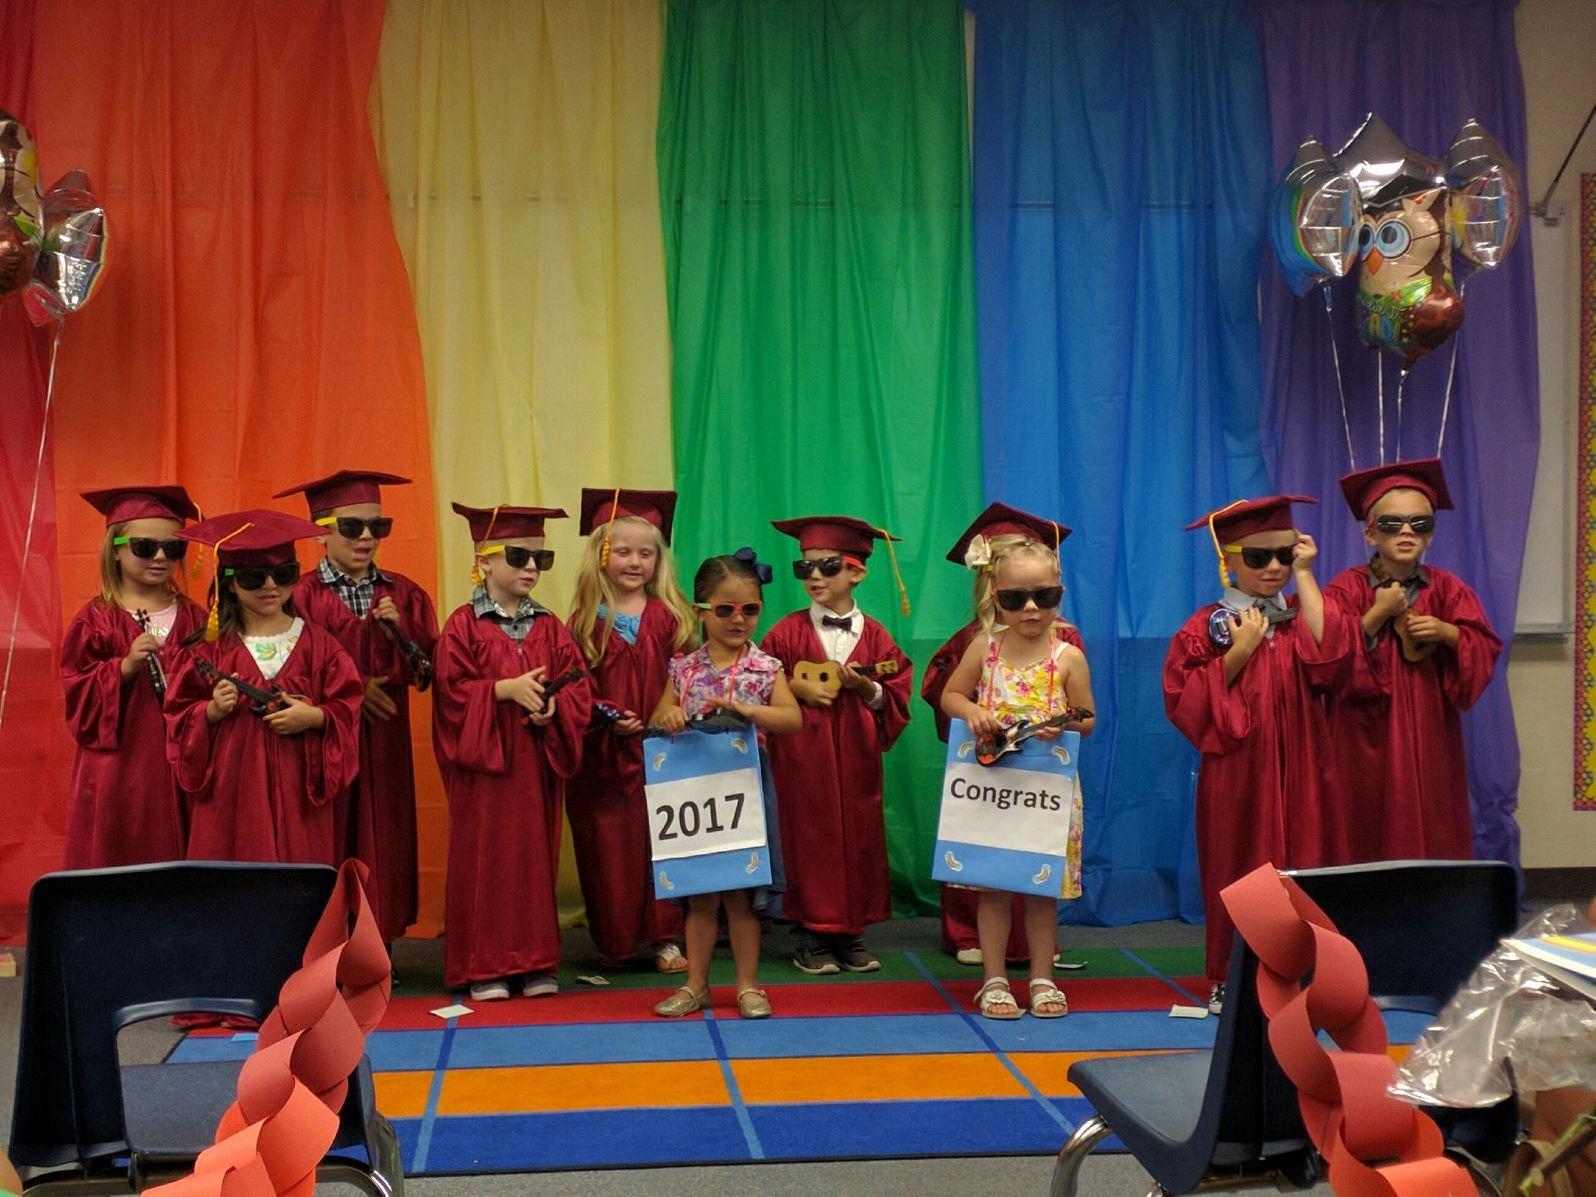 Preschool kids graduating, 2017.